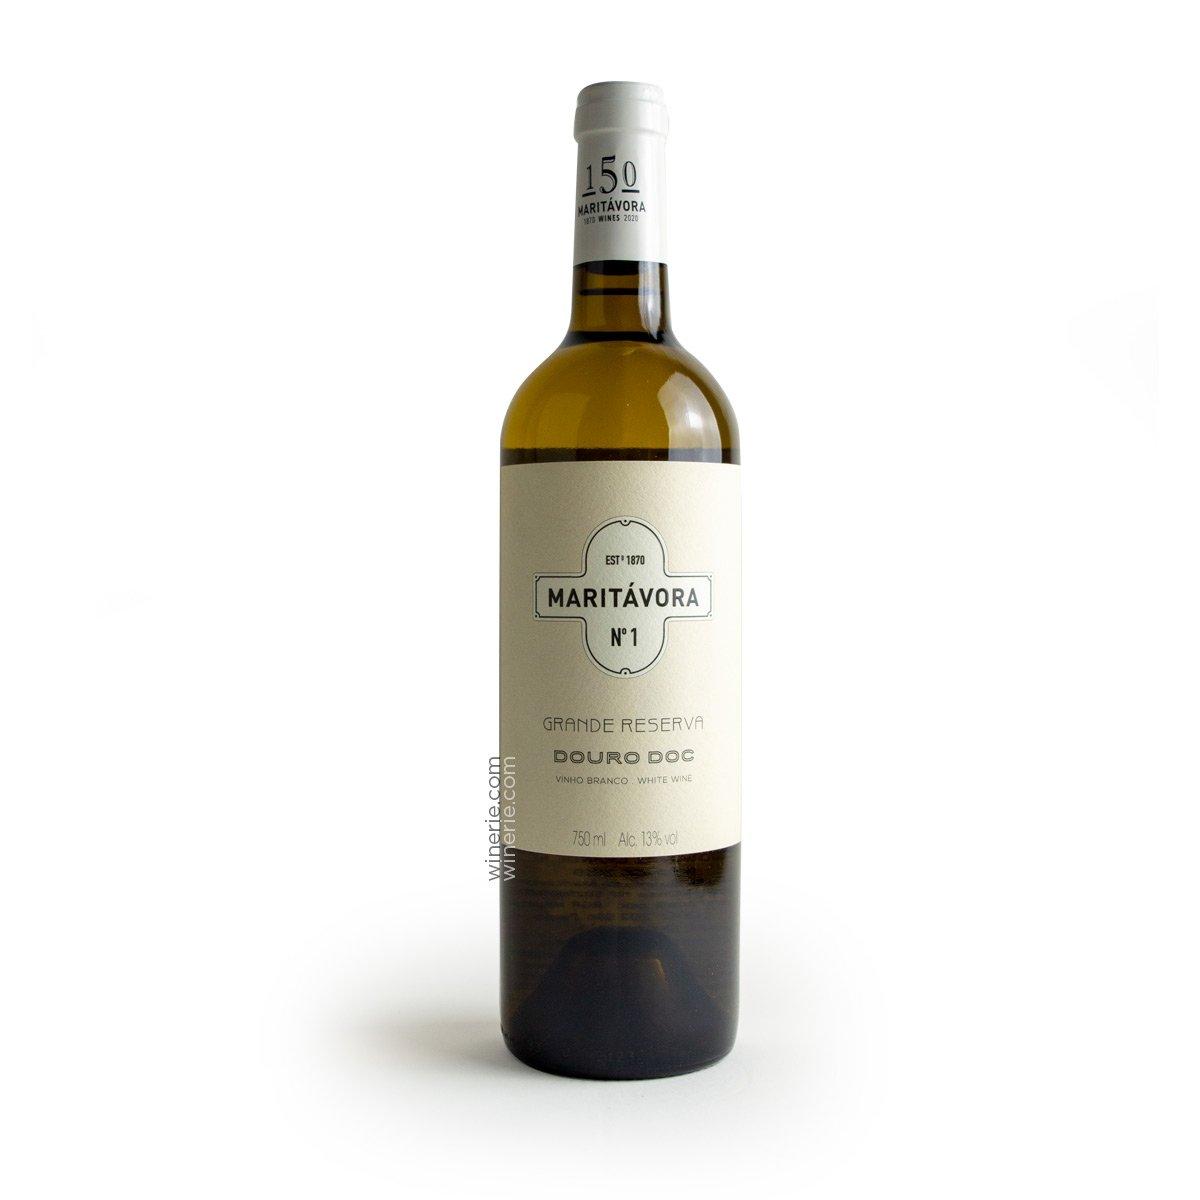 Vinho Portugues Maritavora No. 1 Grande Reserva Branco 2019 750ml